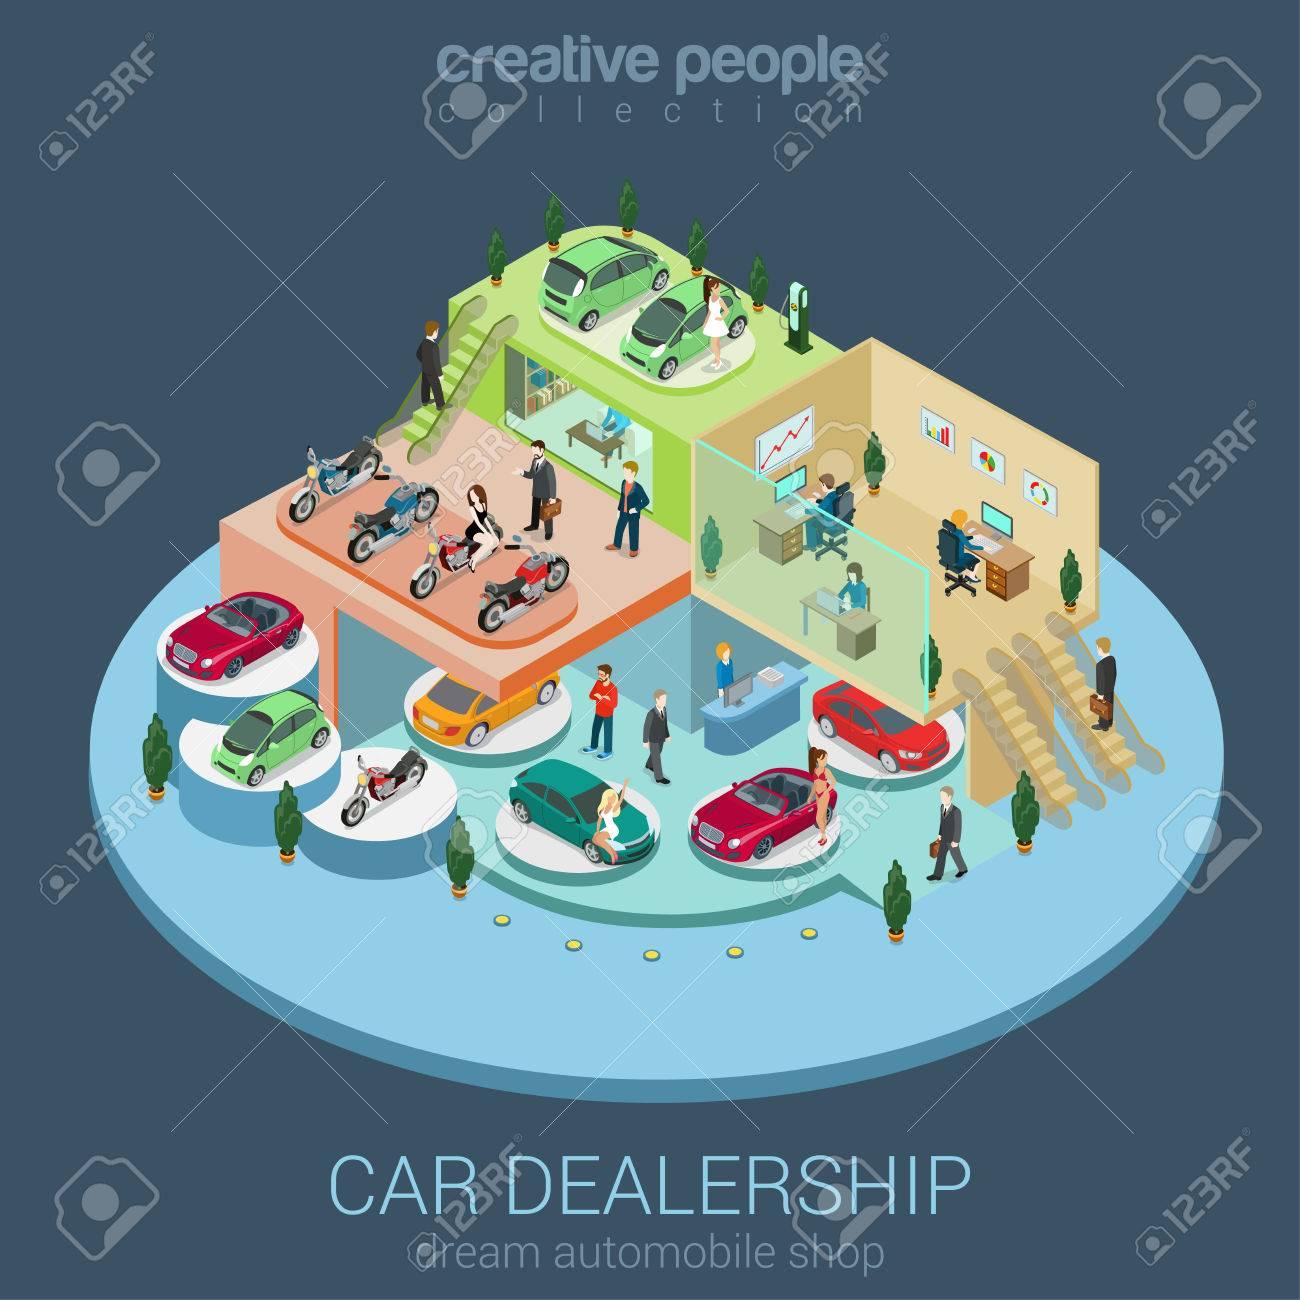 Flat 3d isometric car dealership sale concept vector. Sedan, electric car, convertible cabrio, luxury, motorbike indoor interior floors walking shoppers. Multi-use vehicle salon store business concept - 48578843